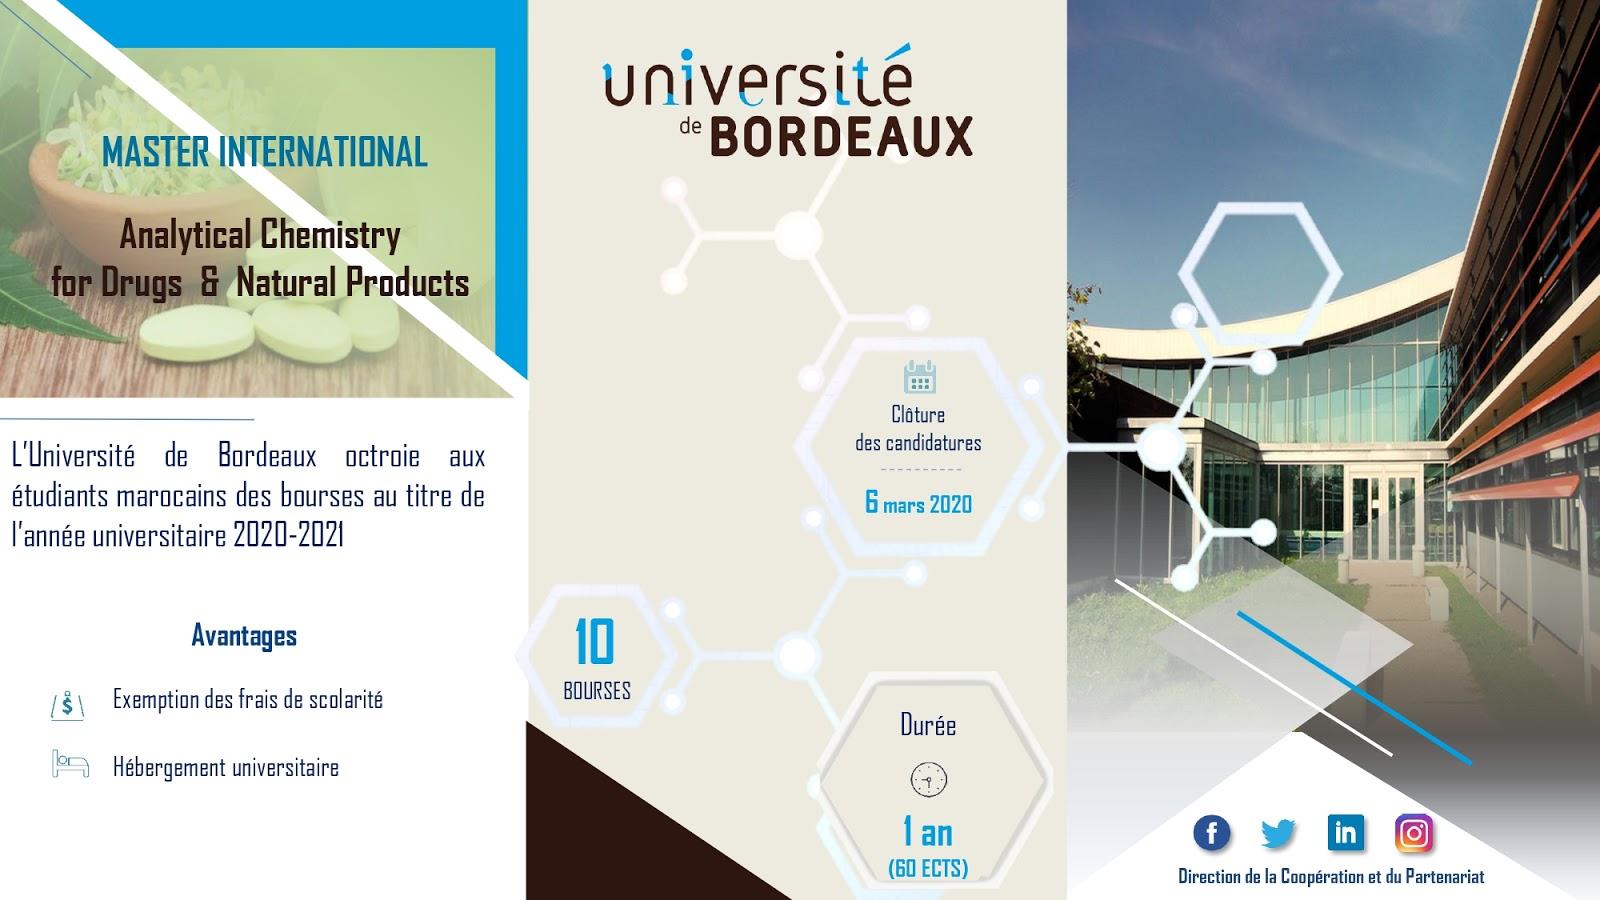 https://apoflux.u-bordeaux.fr/etudiant/